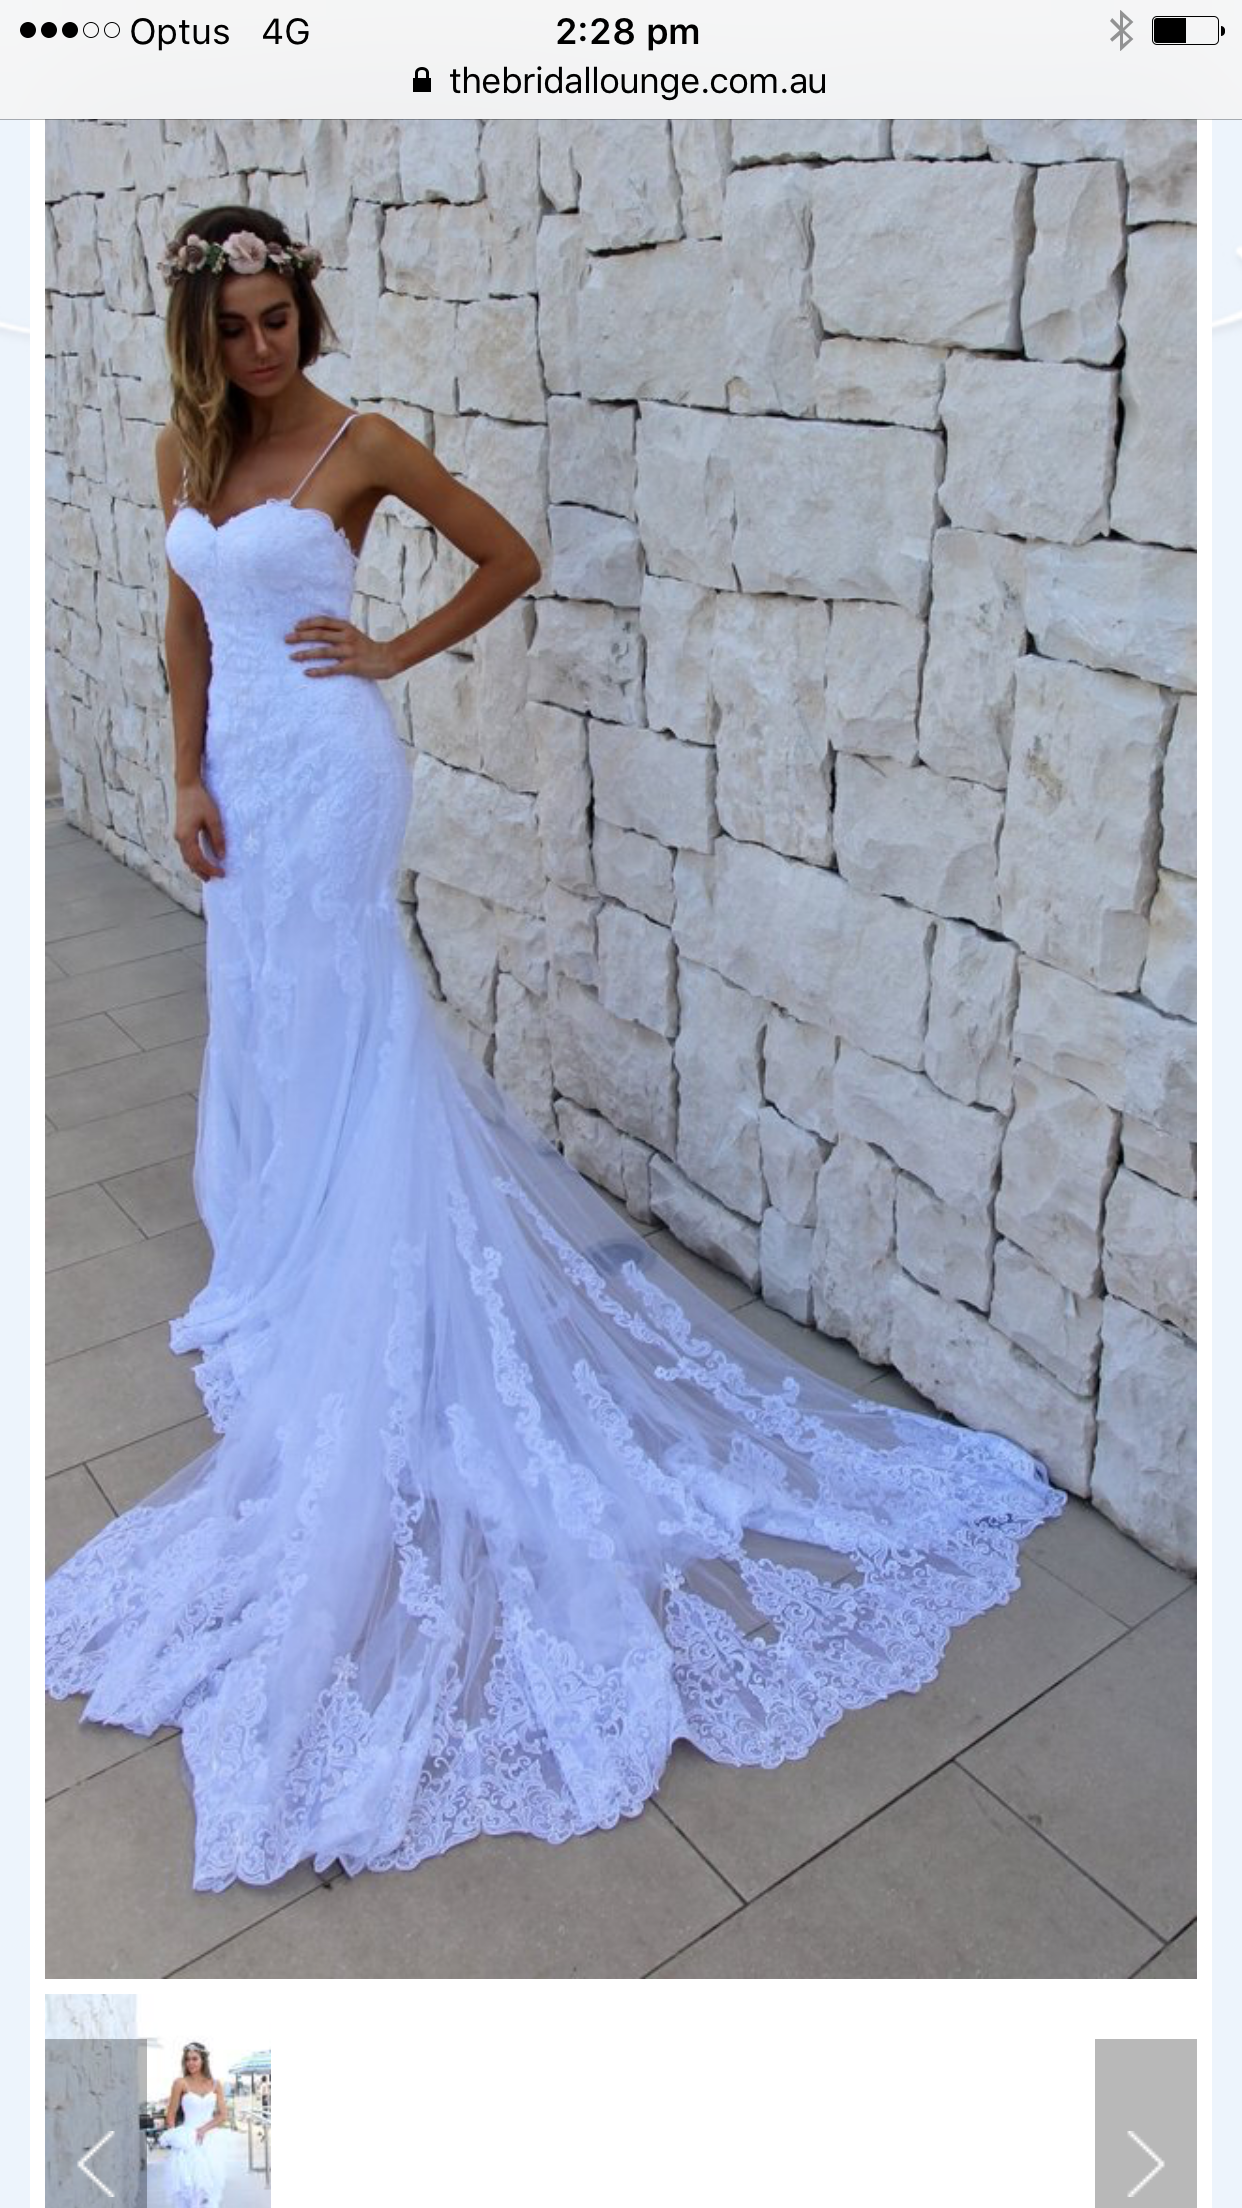 Too much cleavage wedding dress  Star wedding dress  The GC bridal lounge  Dream Dress  Pinterest